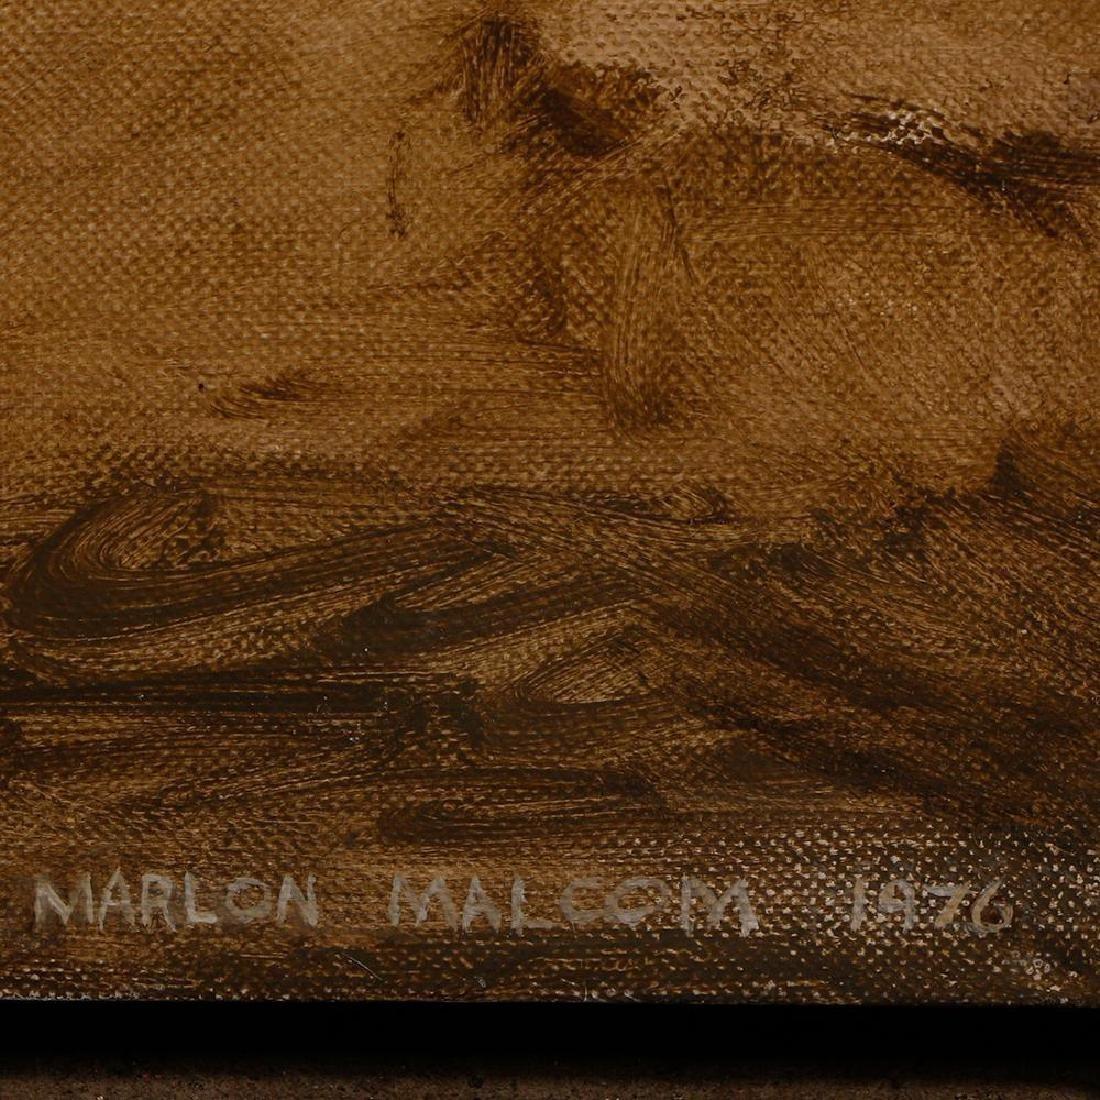 Marlon Malcom (20th/21st century) - 2